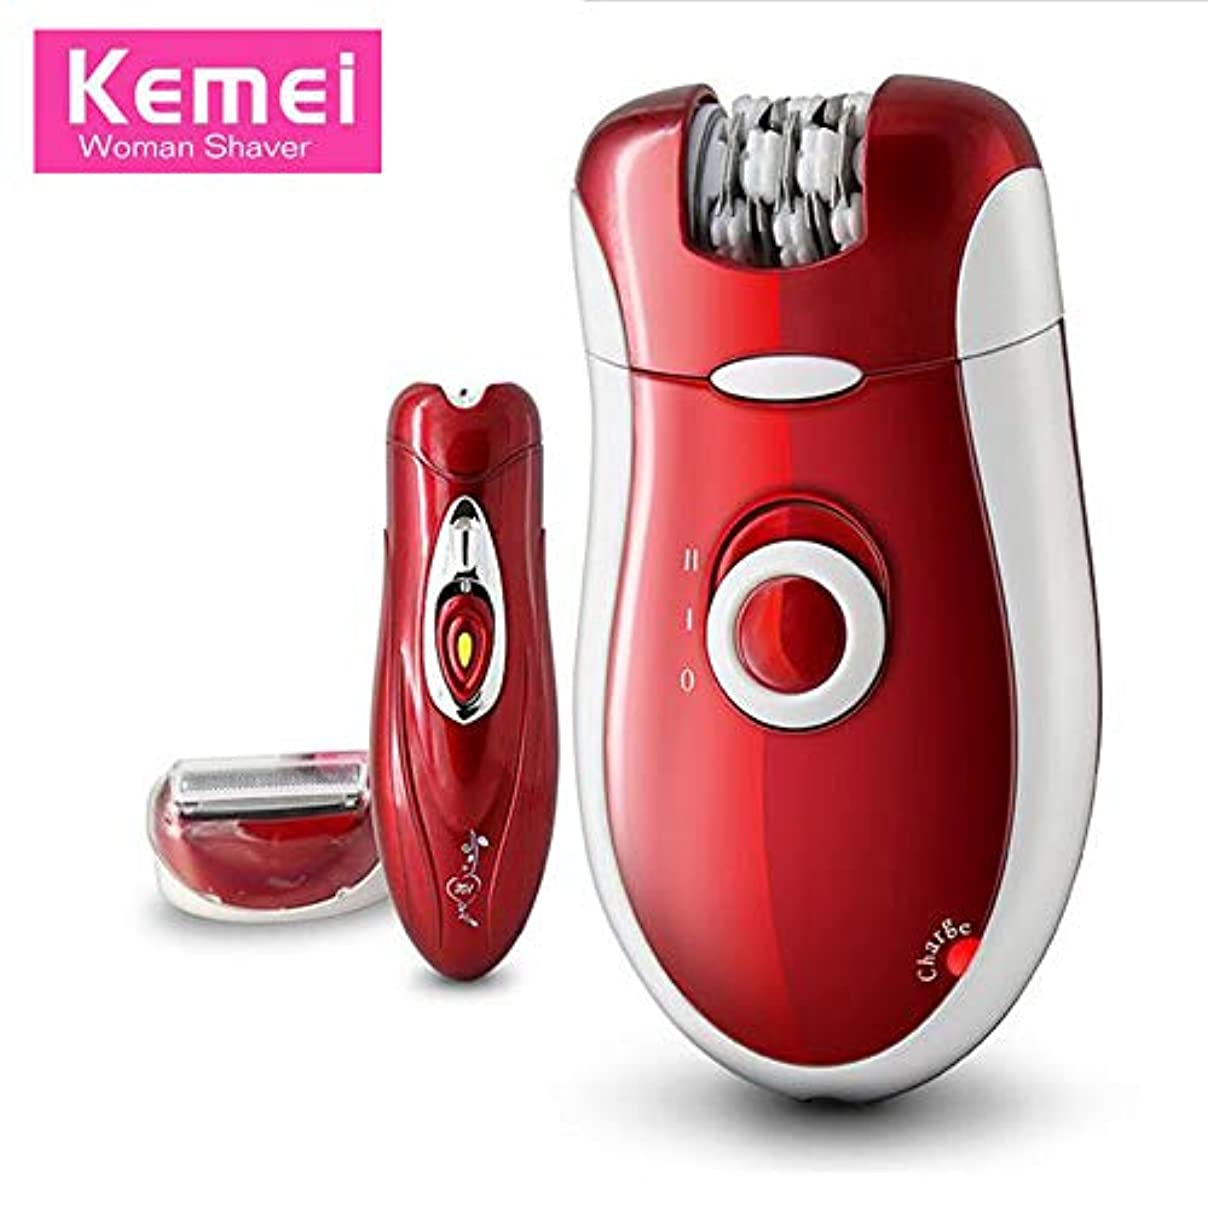 Kemei KM-3068 3 in 1充電式脱毛脱毛器女性シェービングウールデバイスナイフケアボディフェイスレディカミソリ